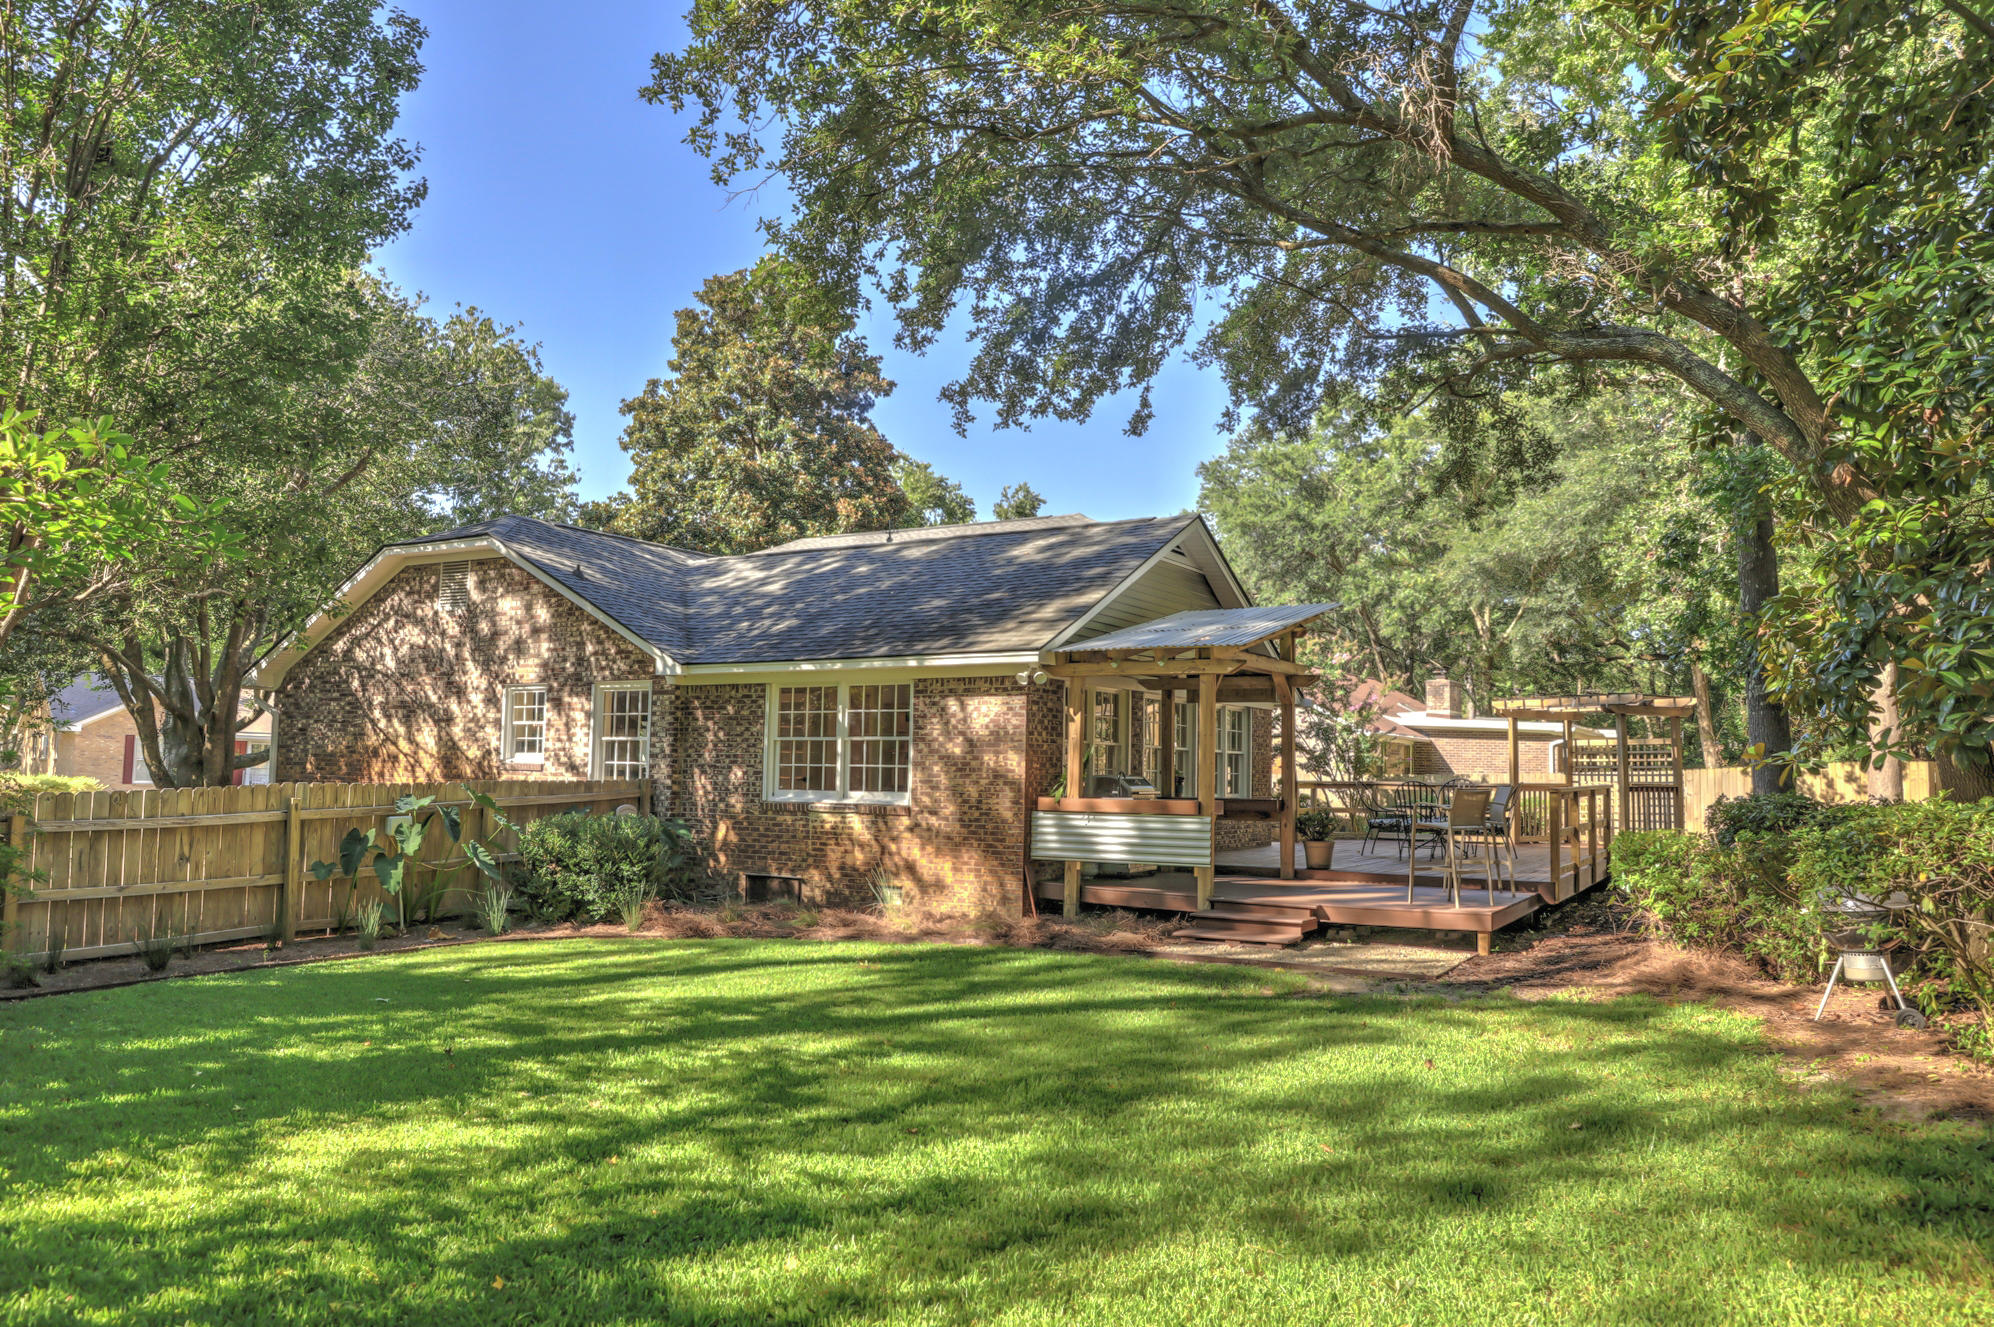 Shemwood II Homes For Sale - 1017 Jack Snipe, Mount Pleasant, SC - 19